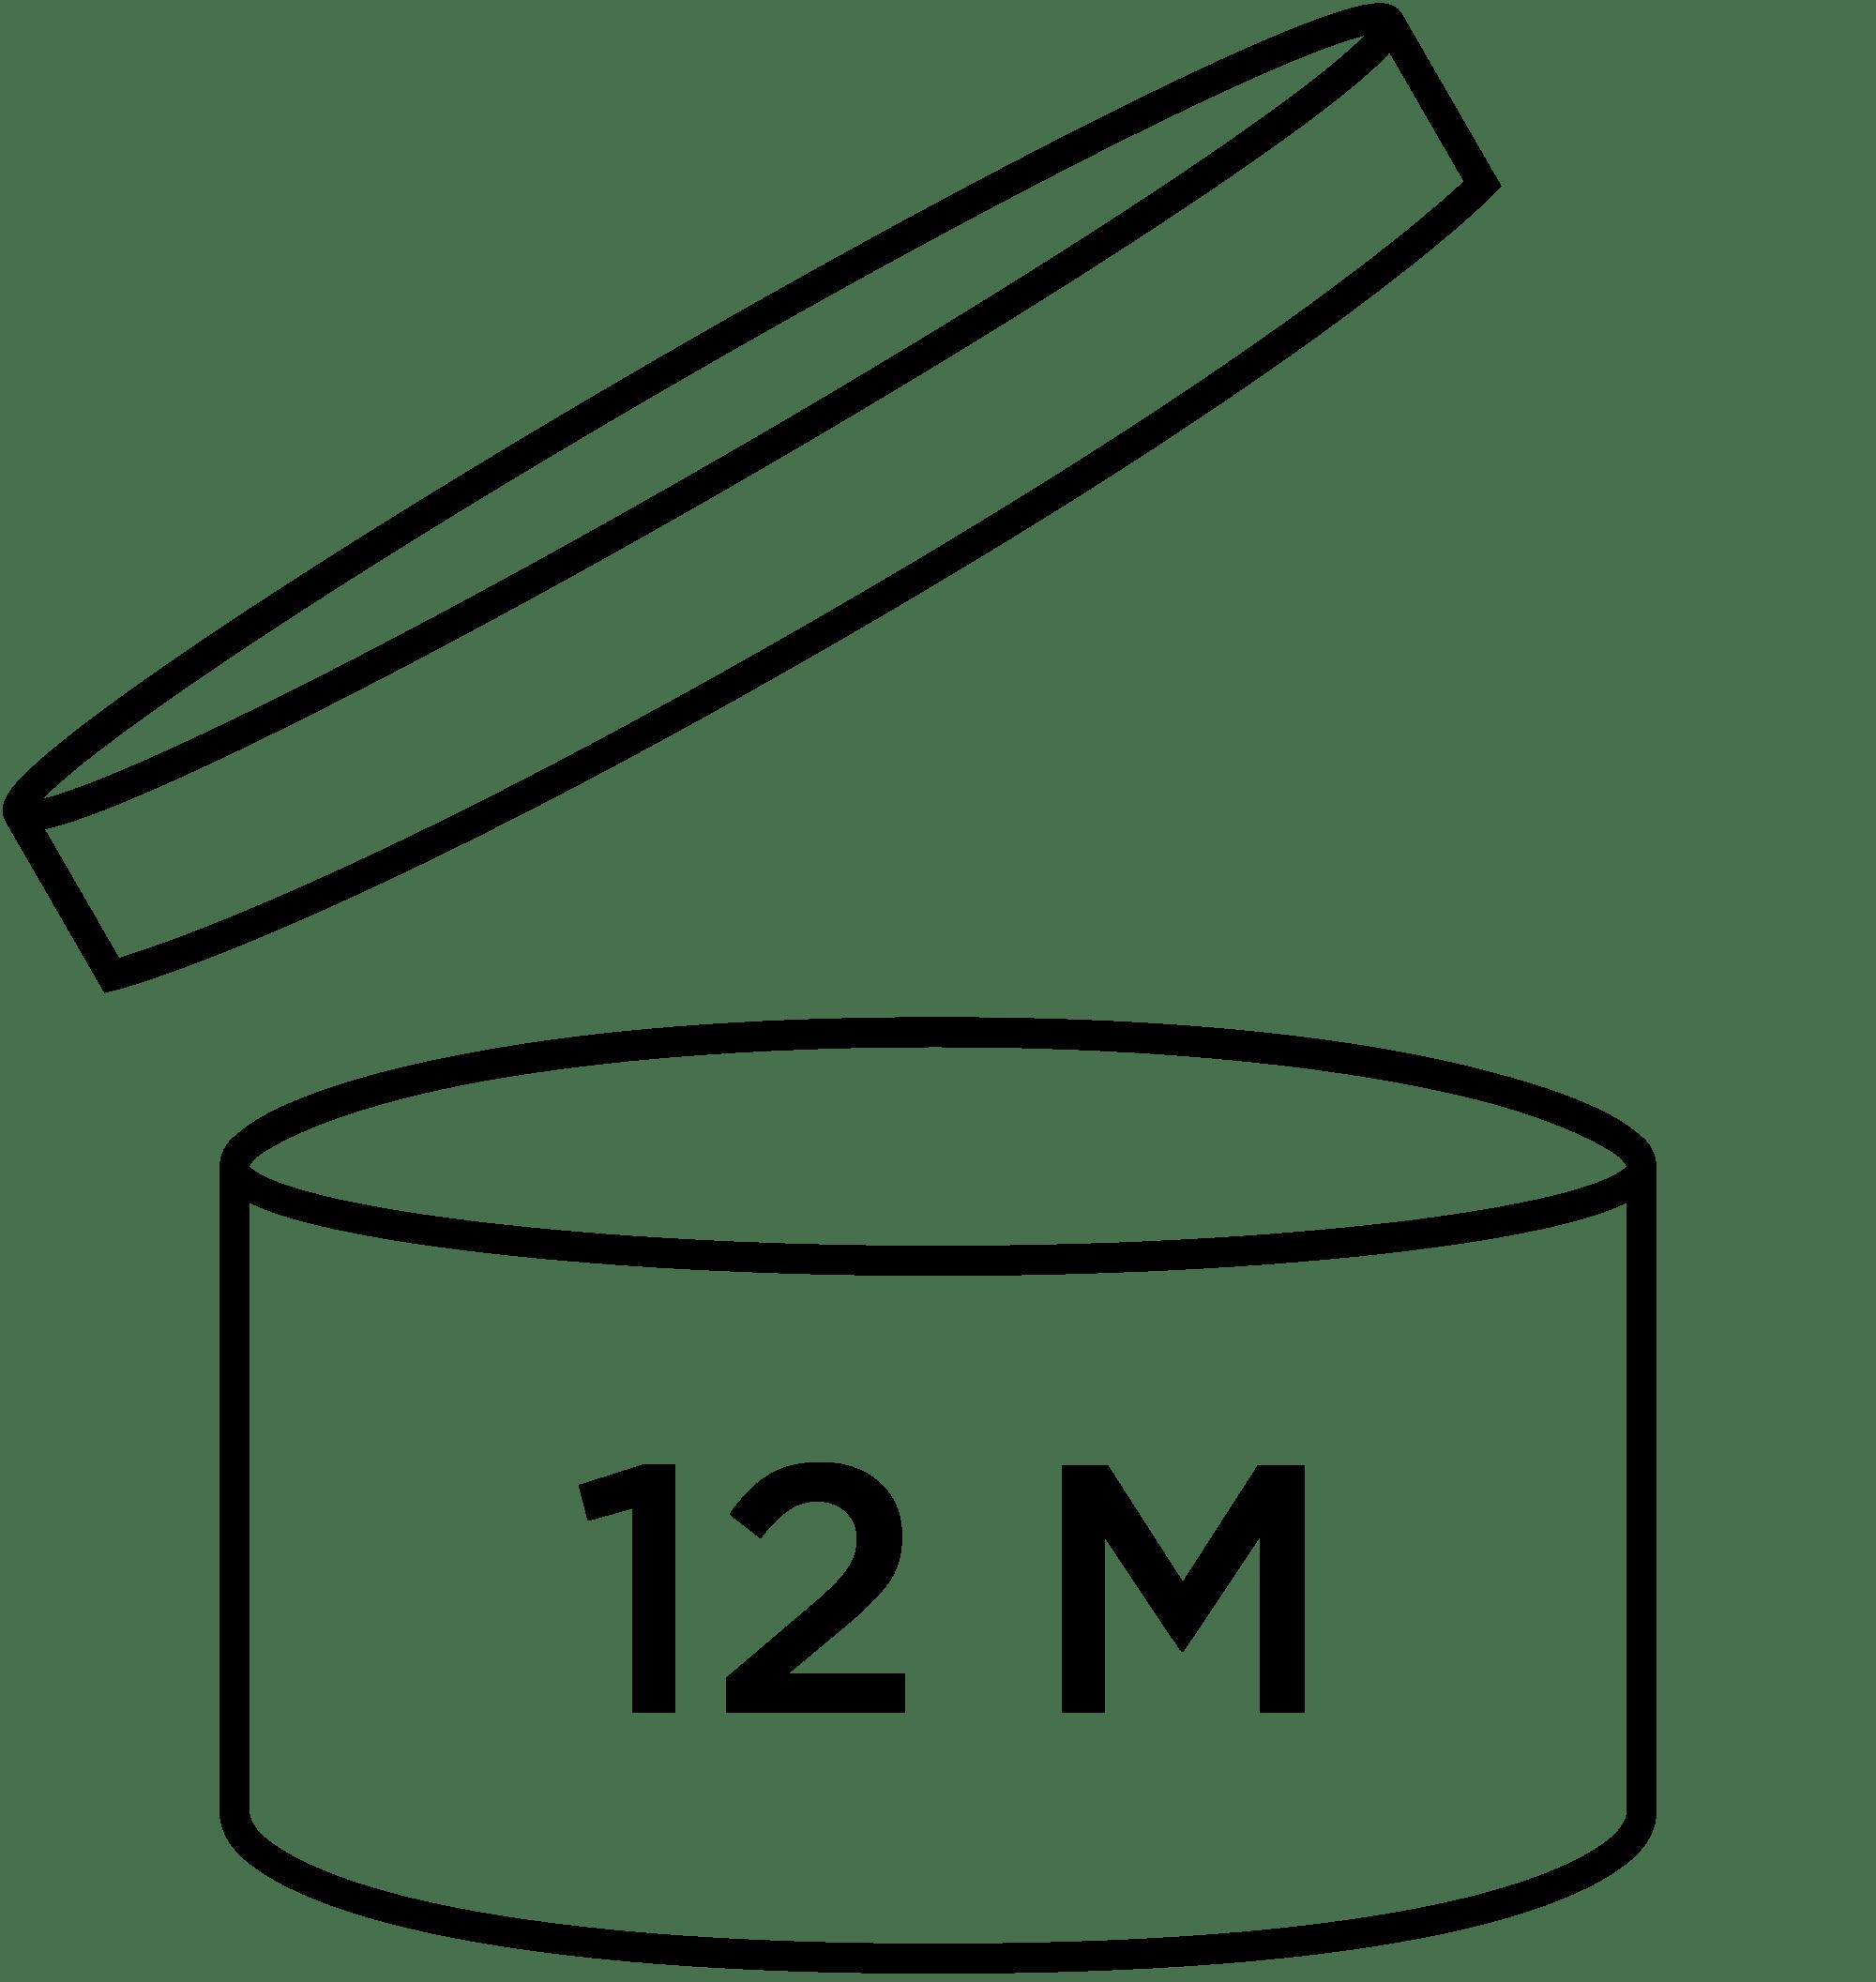 12M_PAO_Symbol.svg